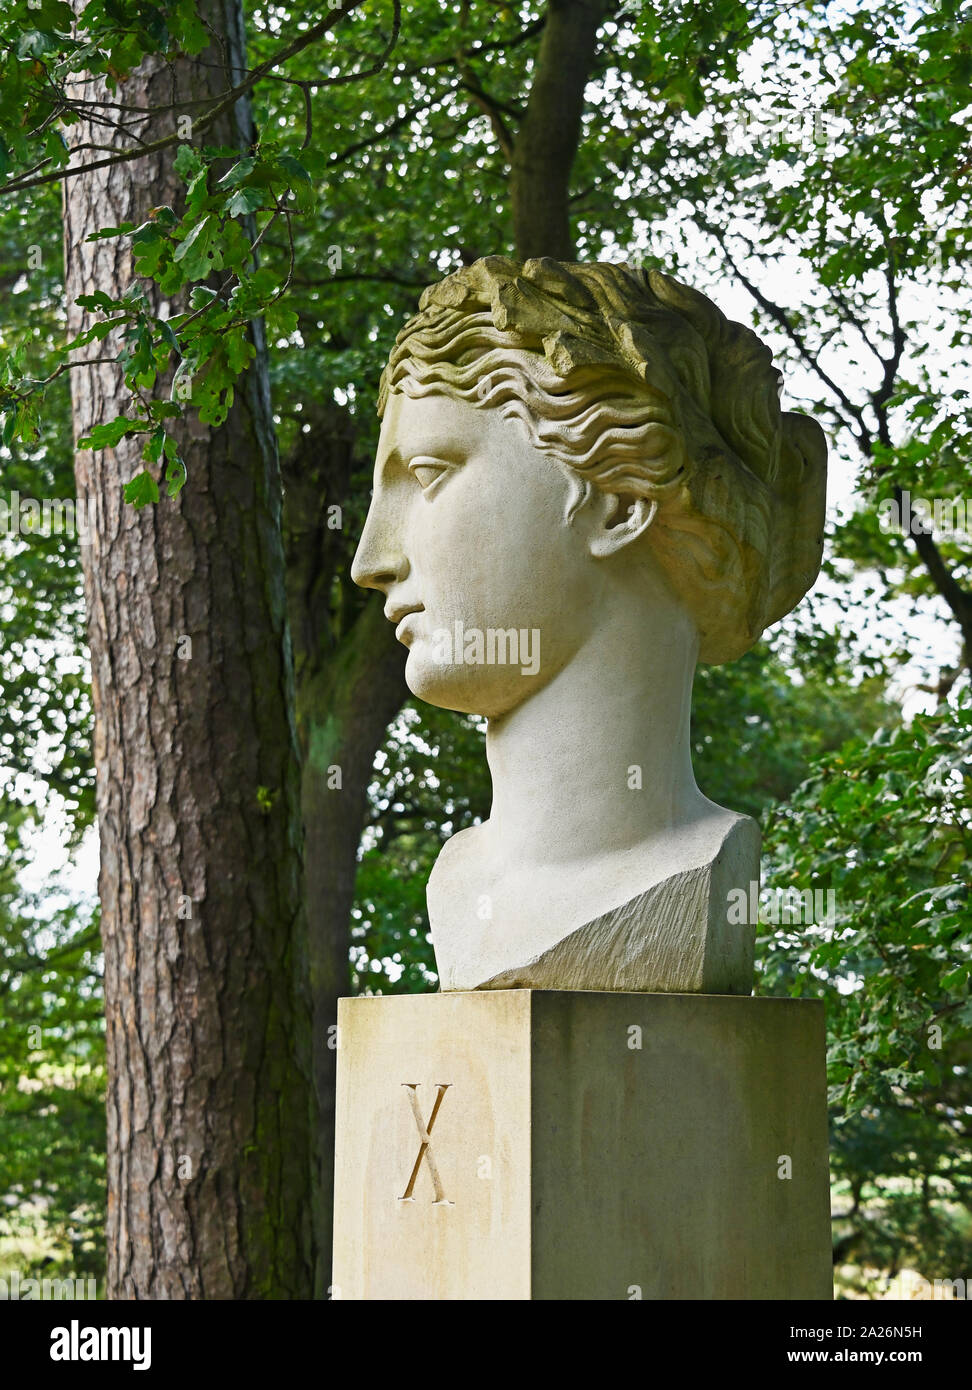 xth-muse-outdoor-artwork-by-ian-hamilton-finlay-gala-hill-wood-jupiter-artland-bonnington-house-wilkieston-west-lothian-scotland-united-king-2A26N5H.jpg